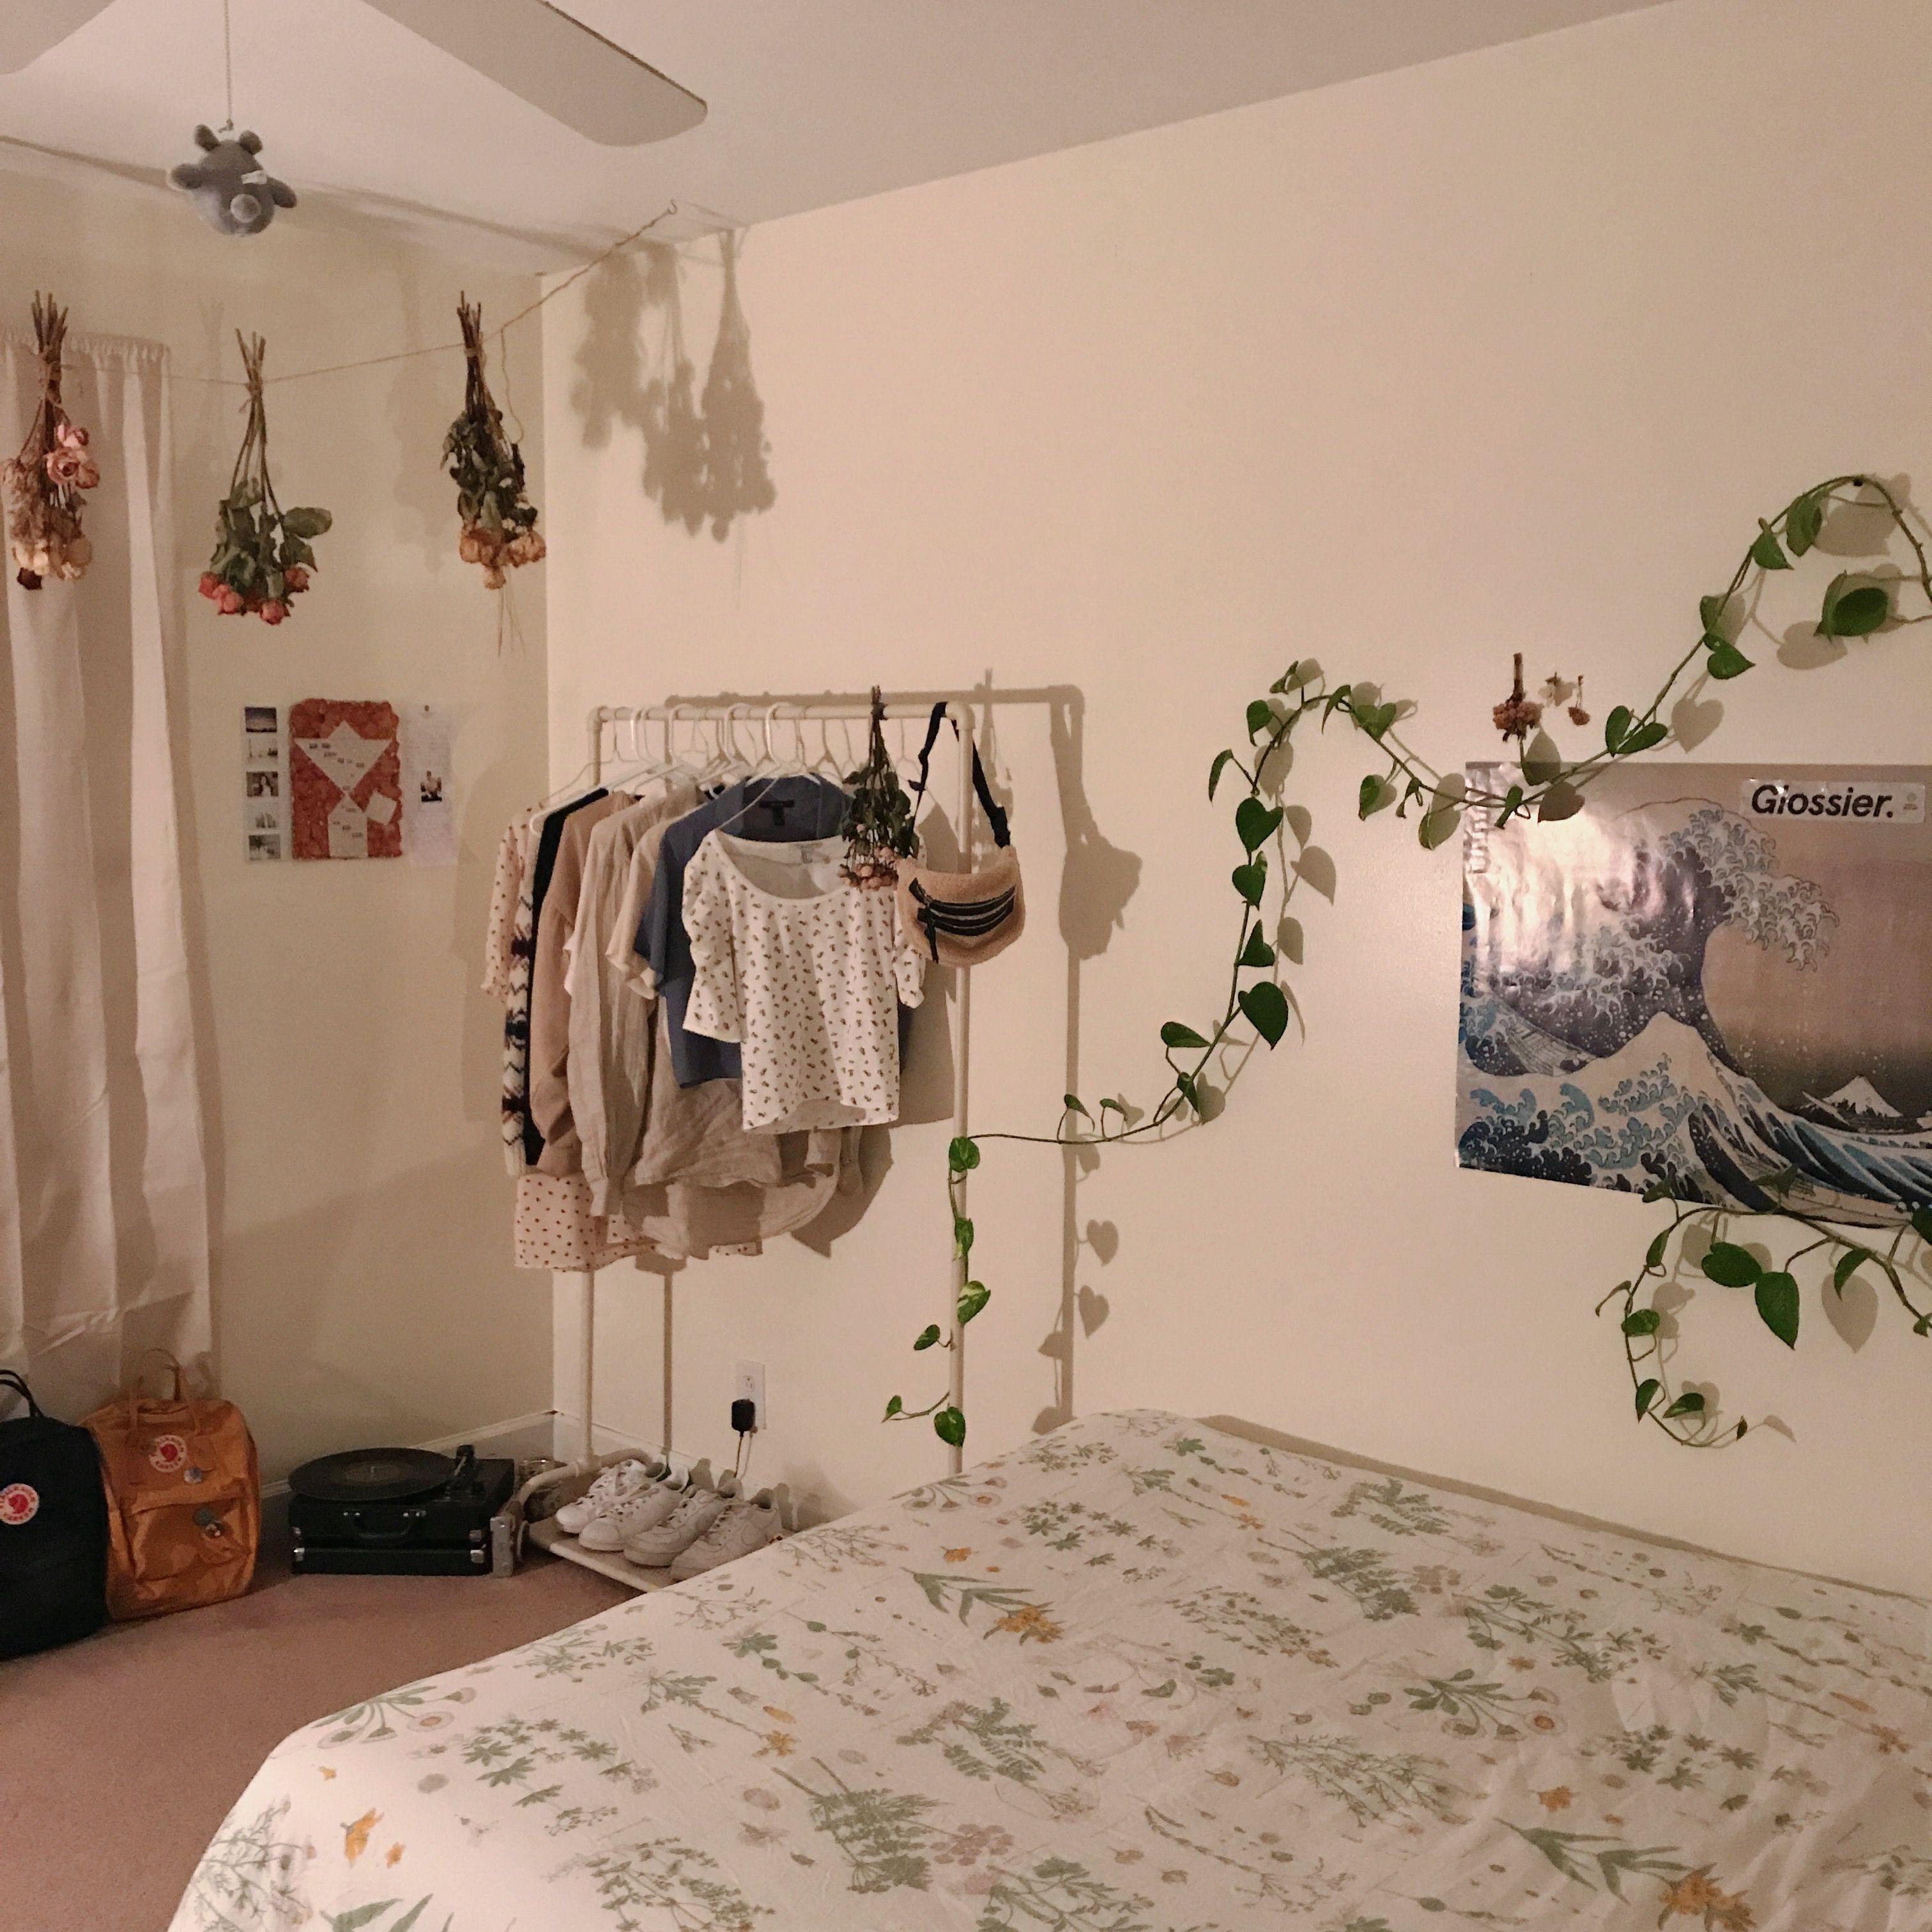 Softflowers also room pinterest bedroom and decor rh